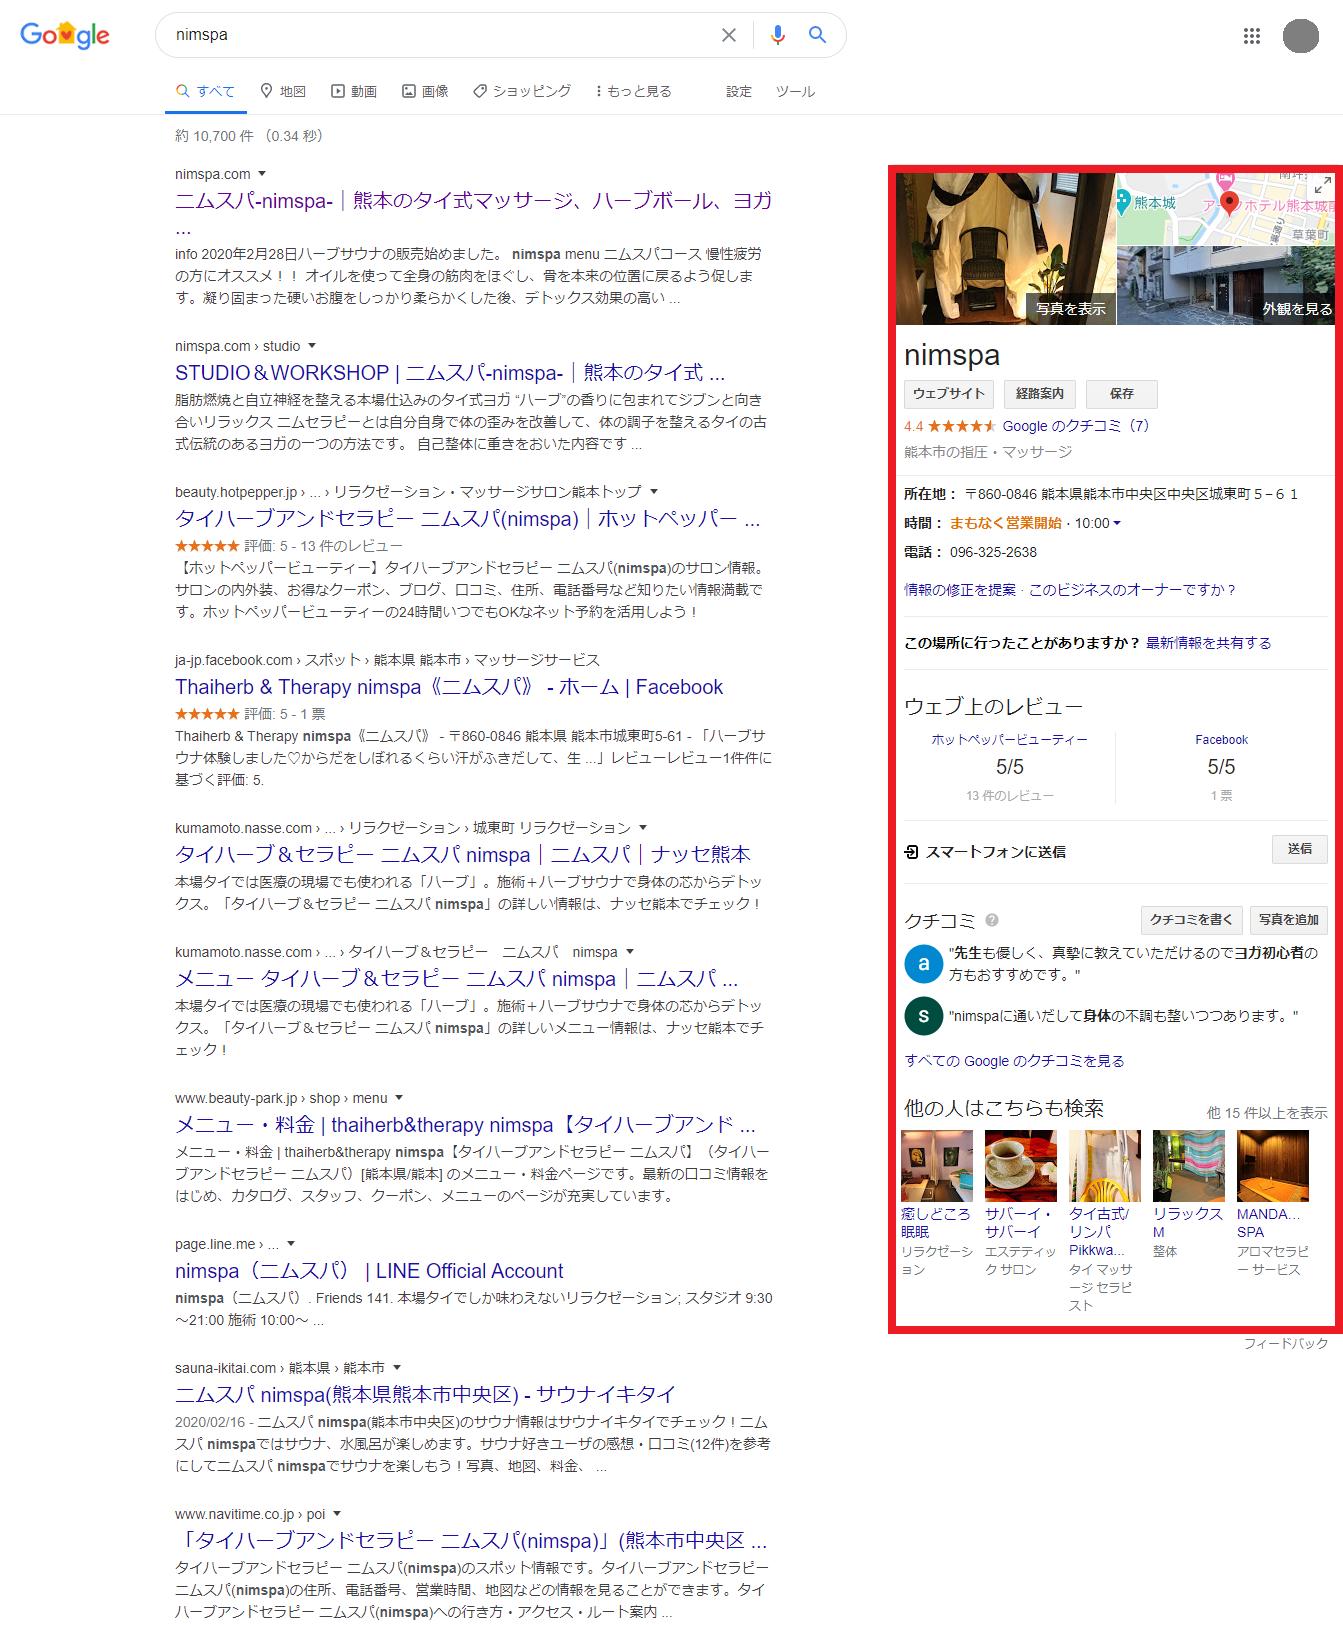 「nimspa」の検索結果